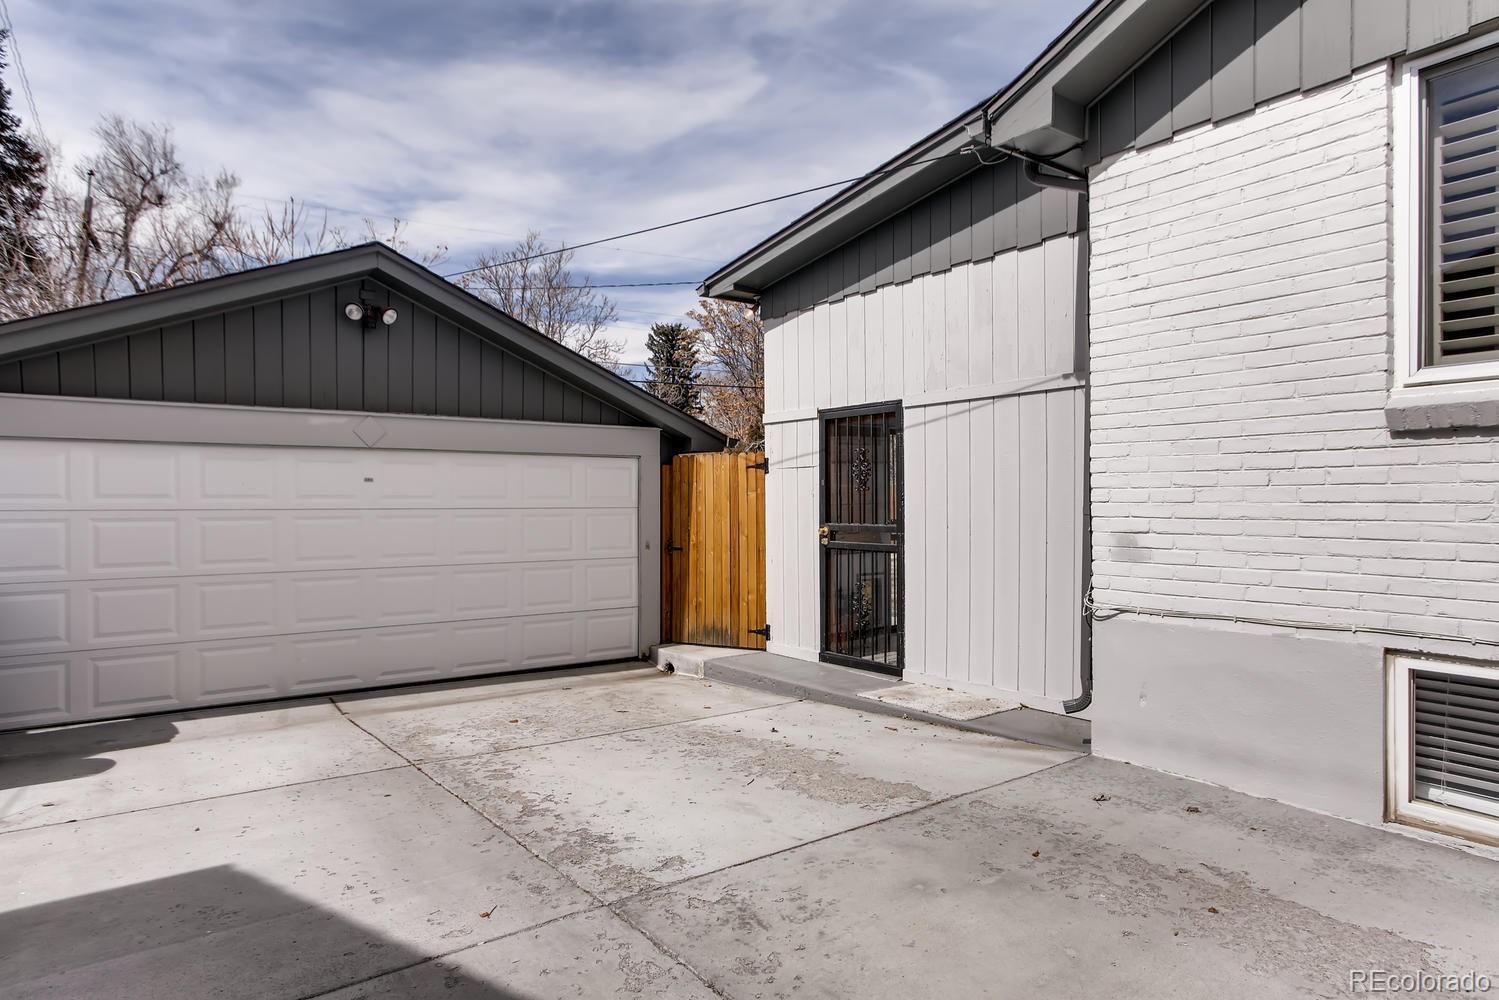 MLS# 8027759 - 26 - 3845 Pierce Street, Wheat Ridge, CO 80033